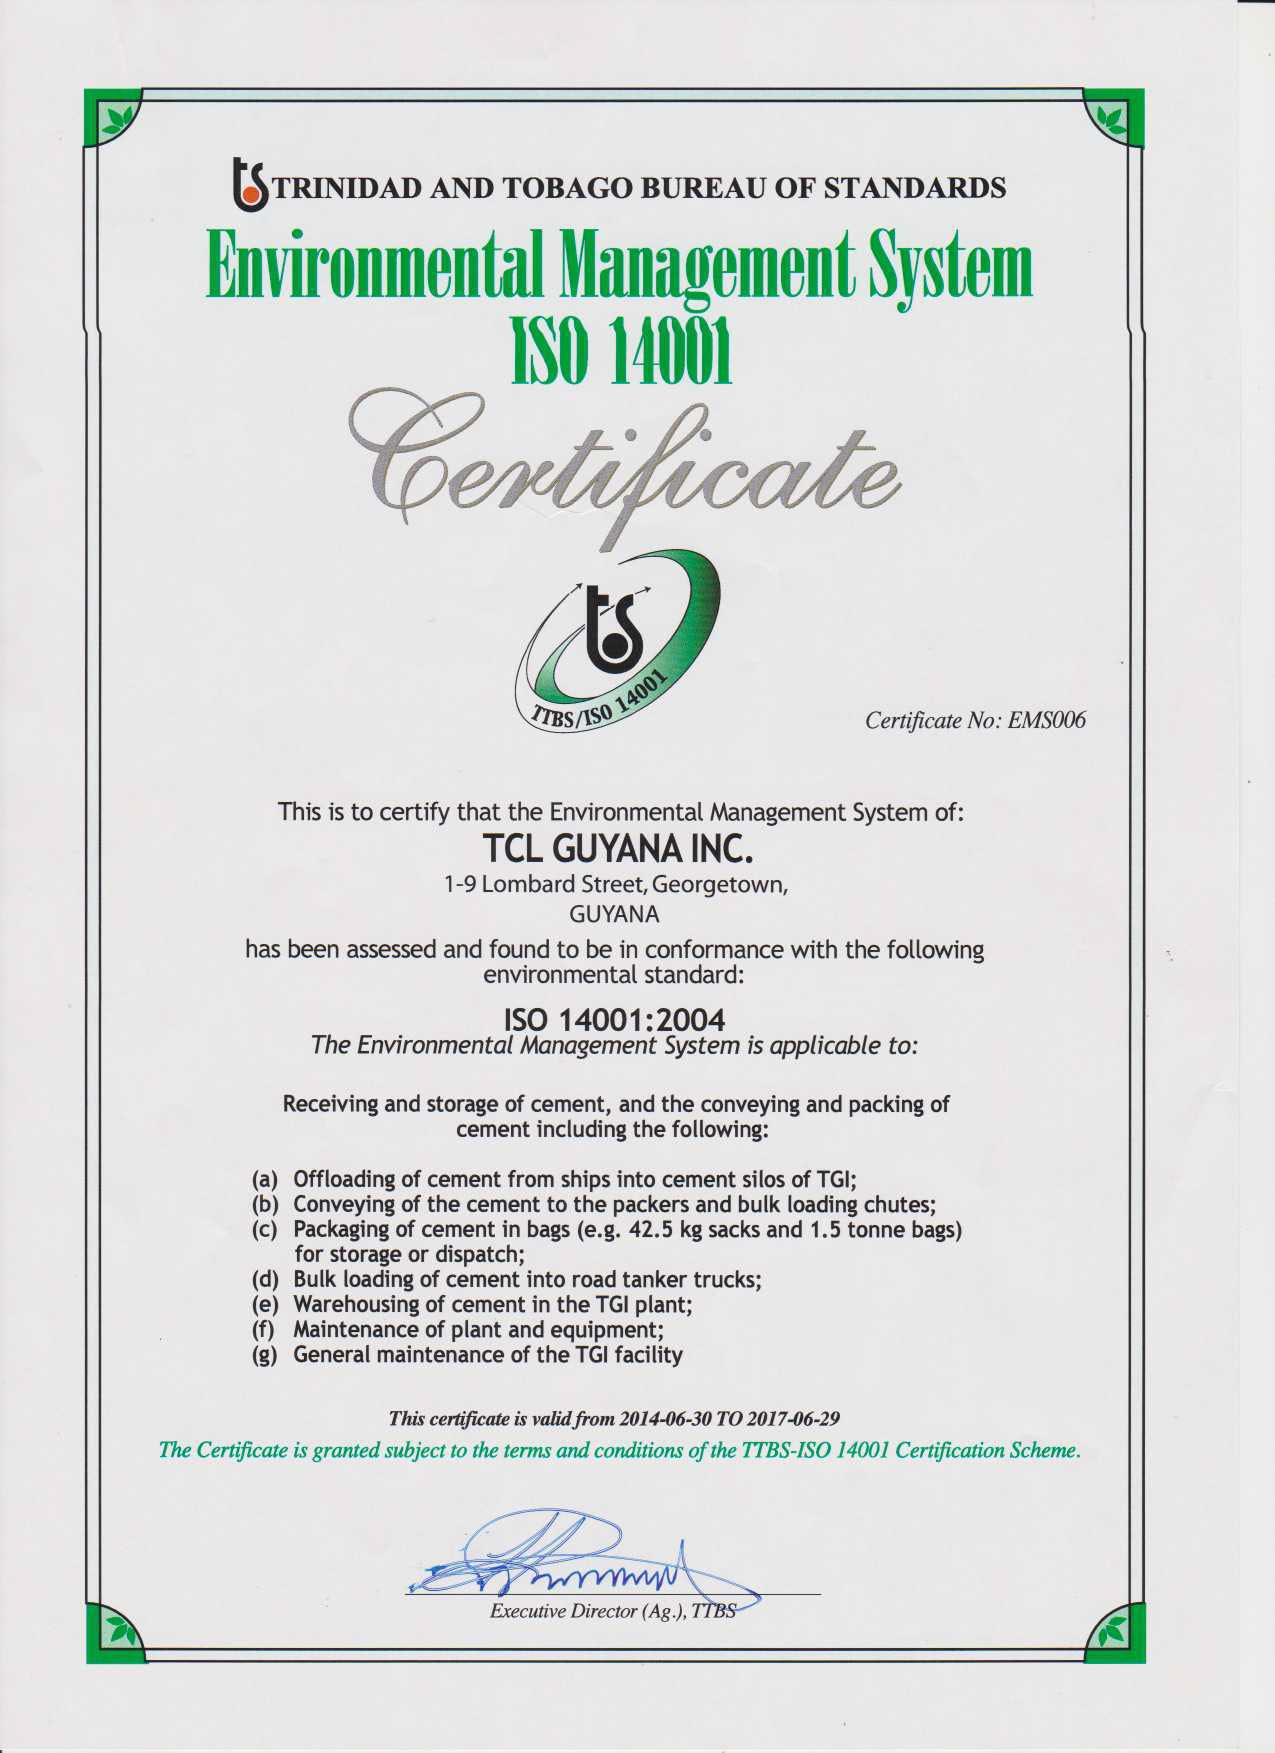 TTBS Certificate